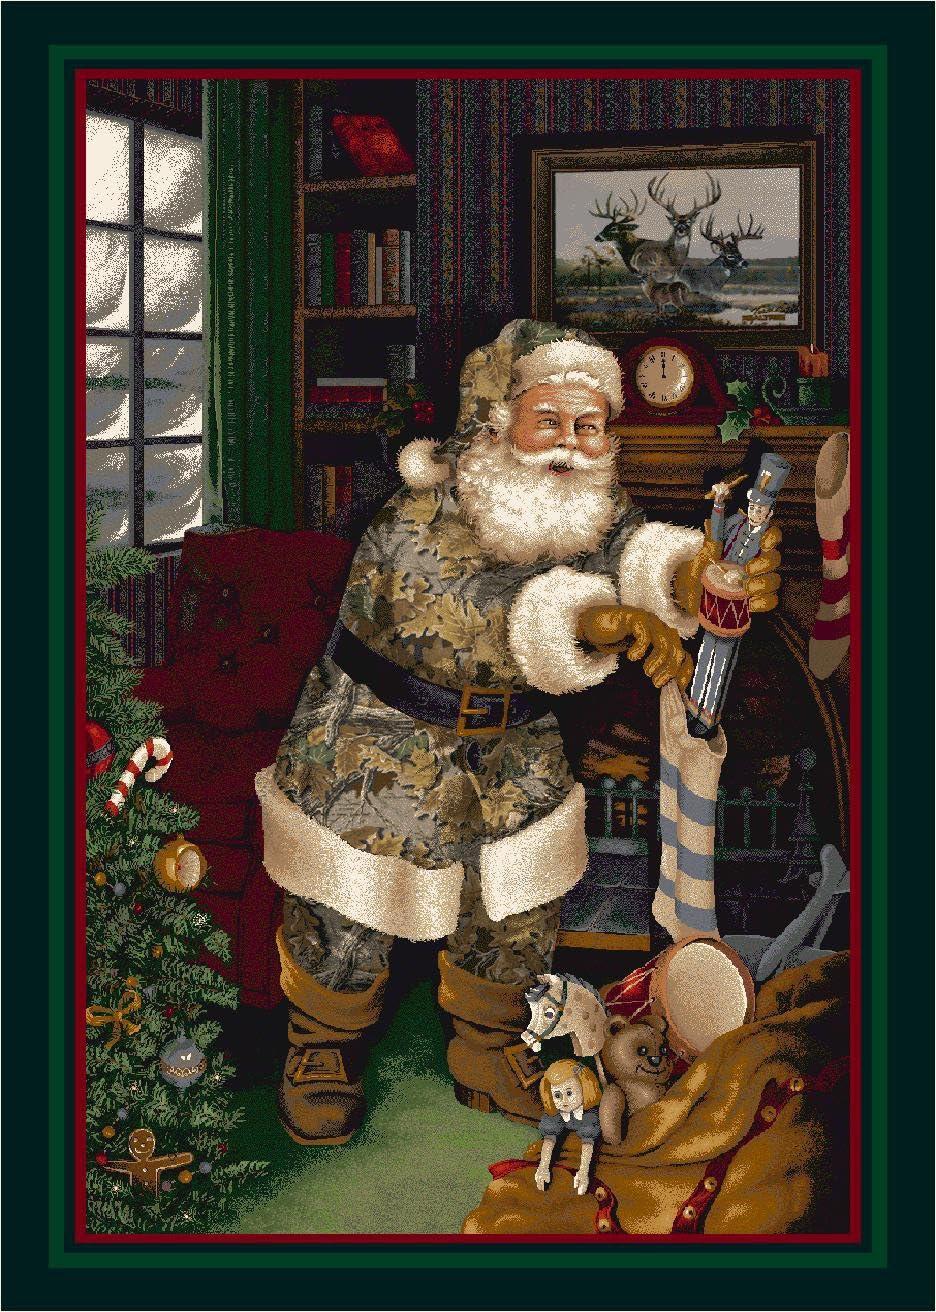 Realtree Camo Santa Christmas Novelty Rug Rug Size 3 10 x 5 4